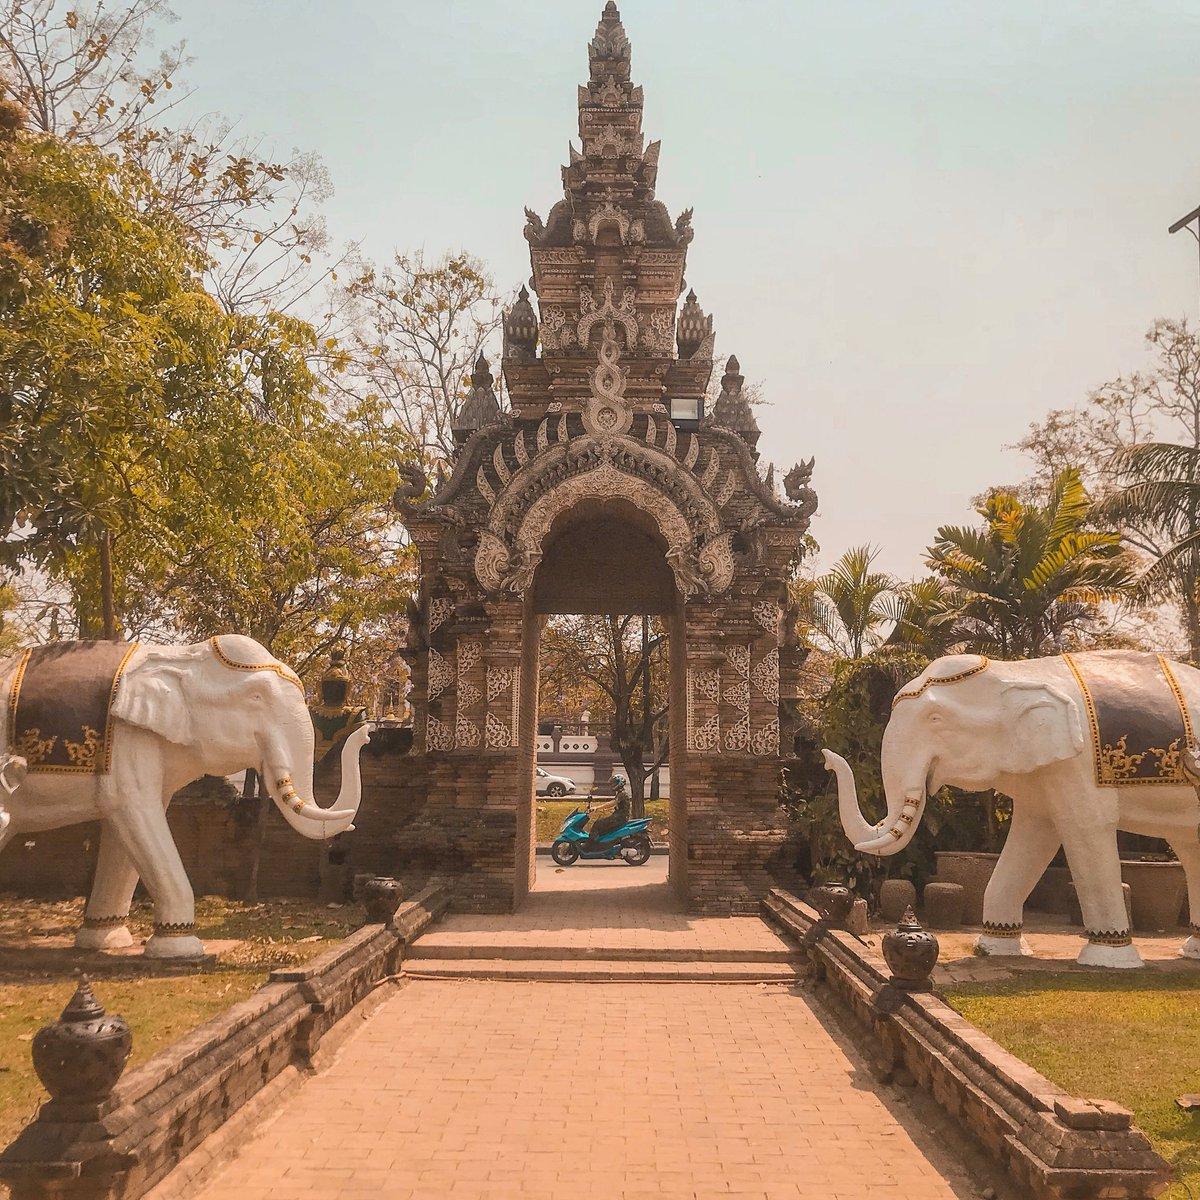 Time traveling #RoyWanders #Thailand #ChiangMai #WatLokMolee #ChiangMaiDiaries https://instagram.com/p/BgihCC8l1Ul/pic.twitter.com/C7pLmbAyxD